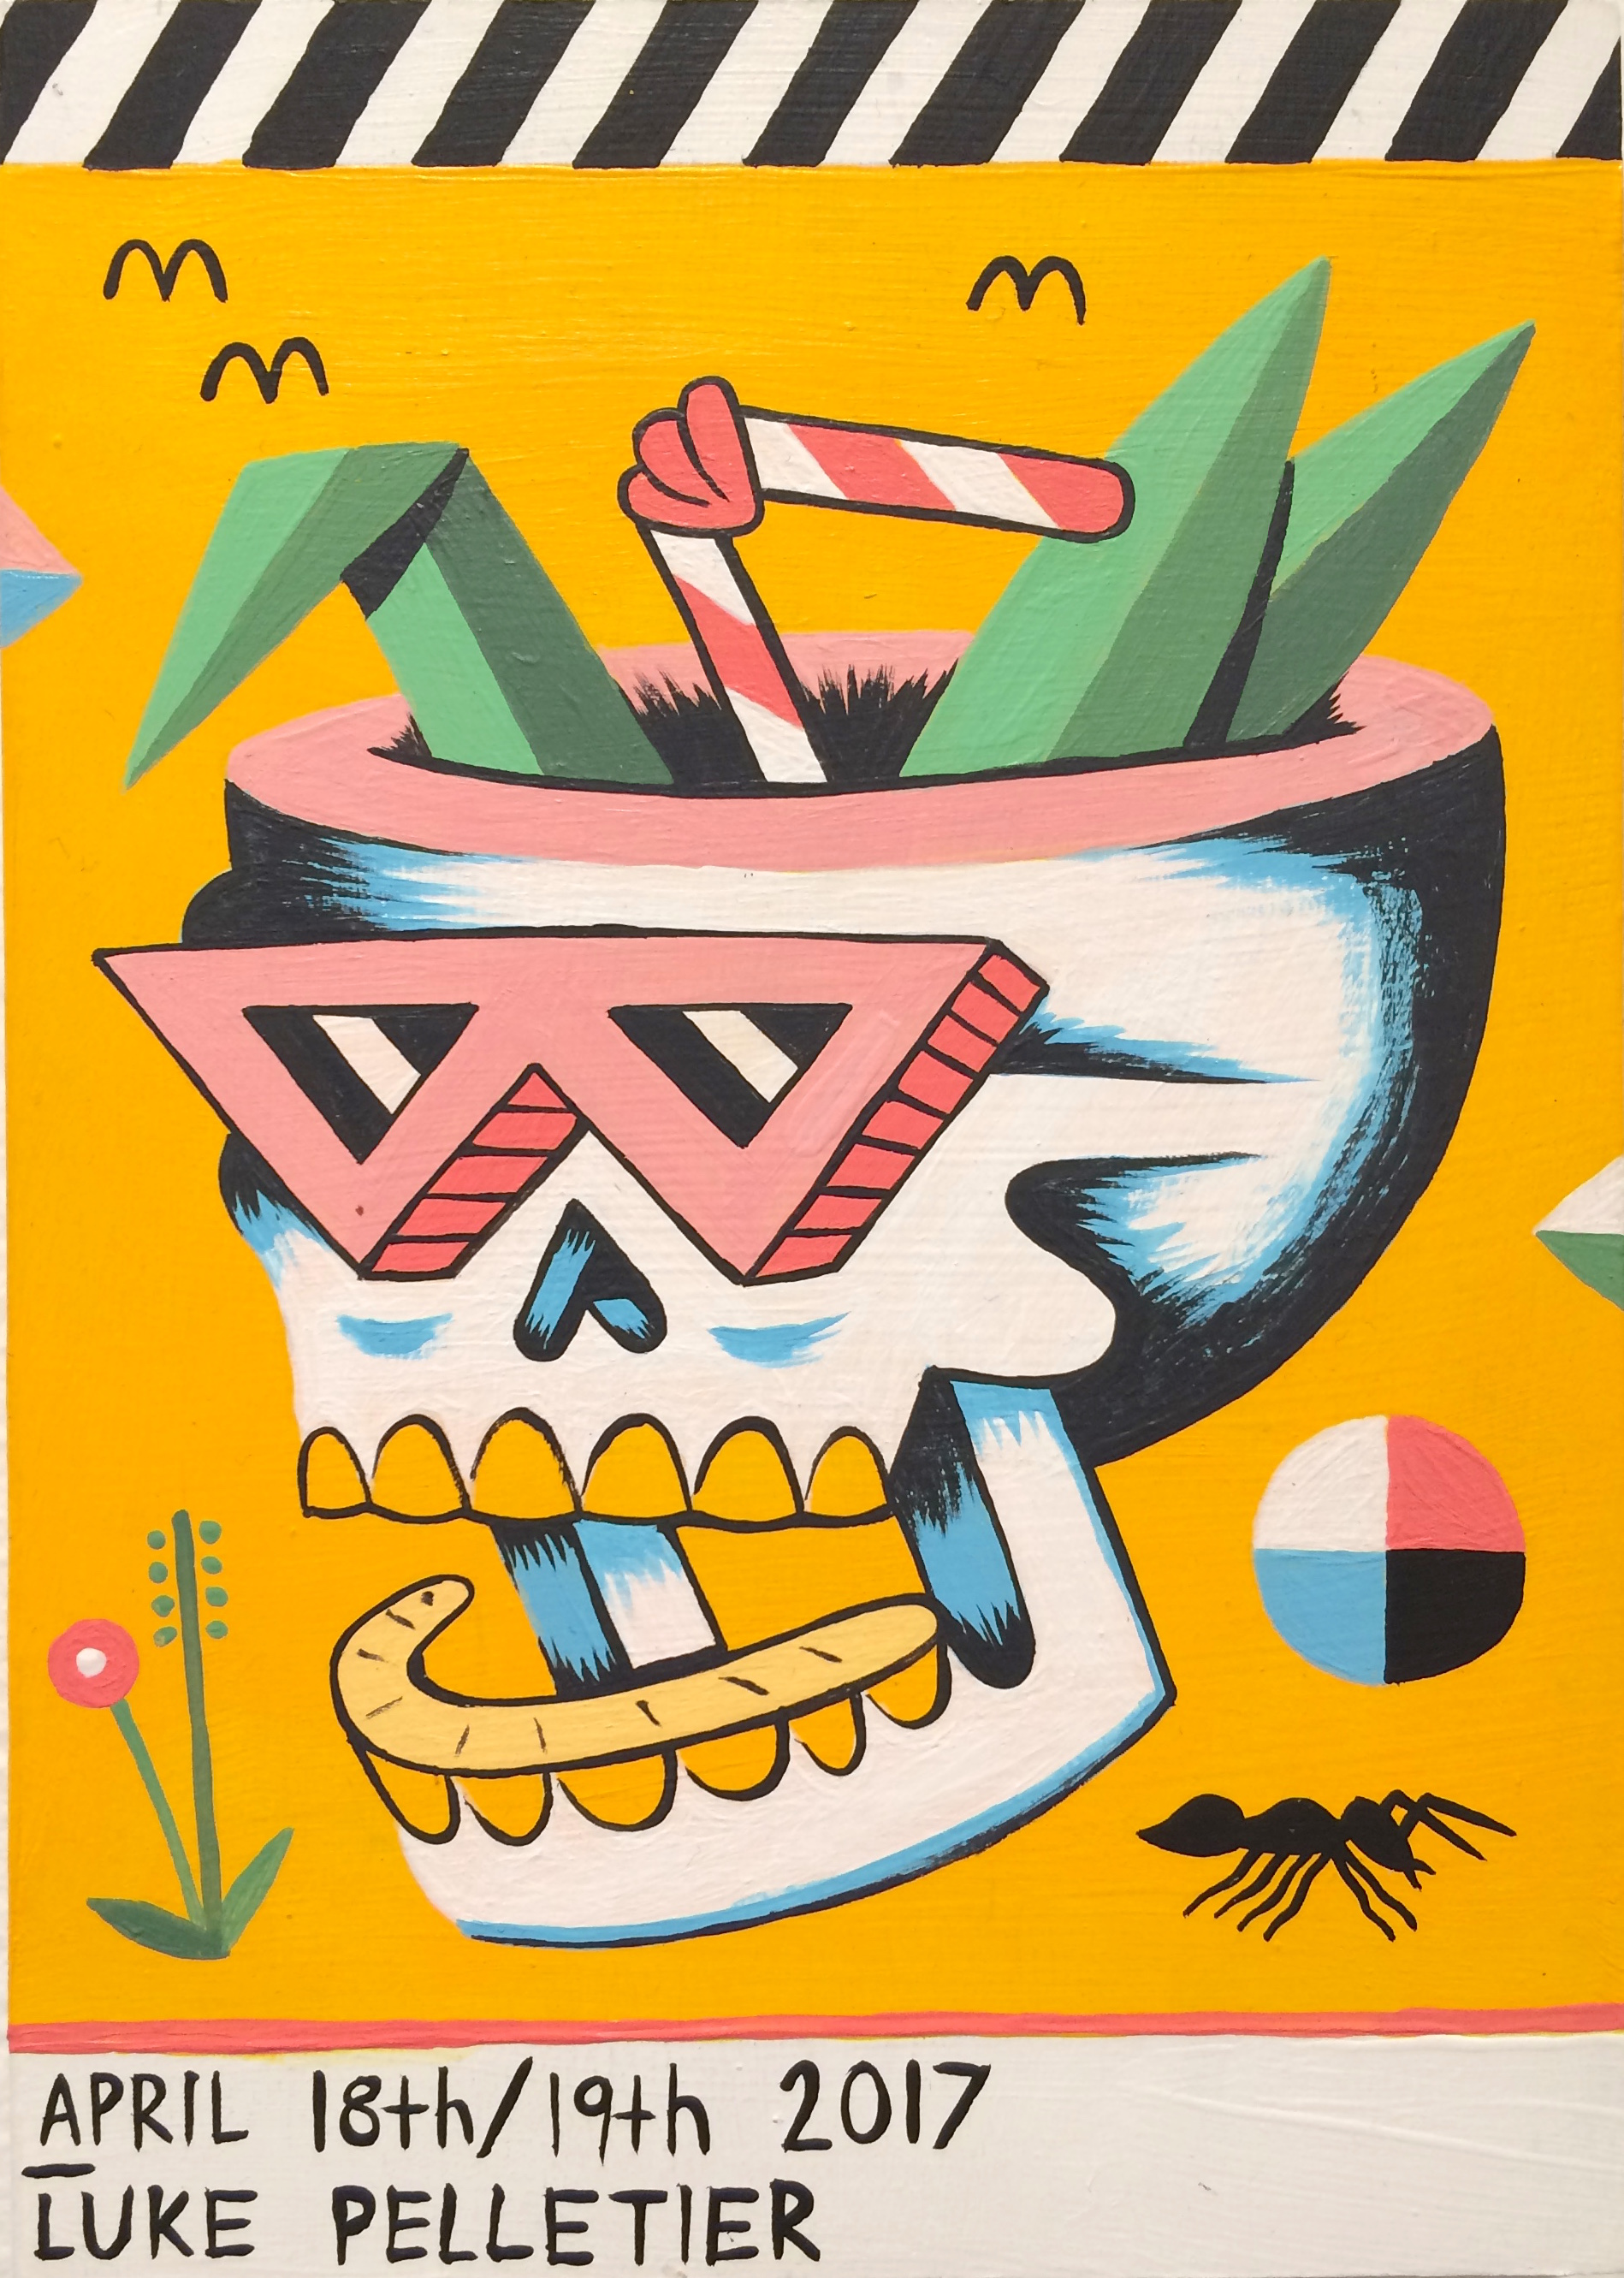 Luke Pelletier / Skull Cocktail / 2017 / Acrylic on wood panel / 7 x 5 inches